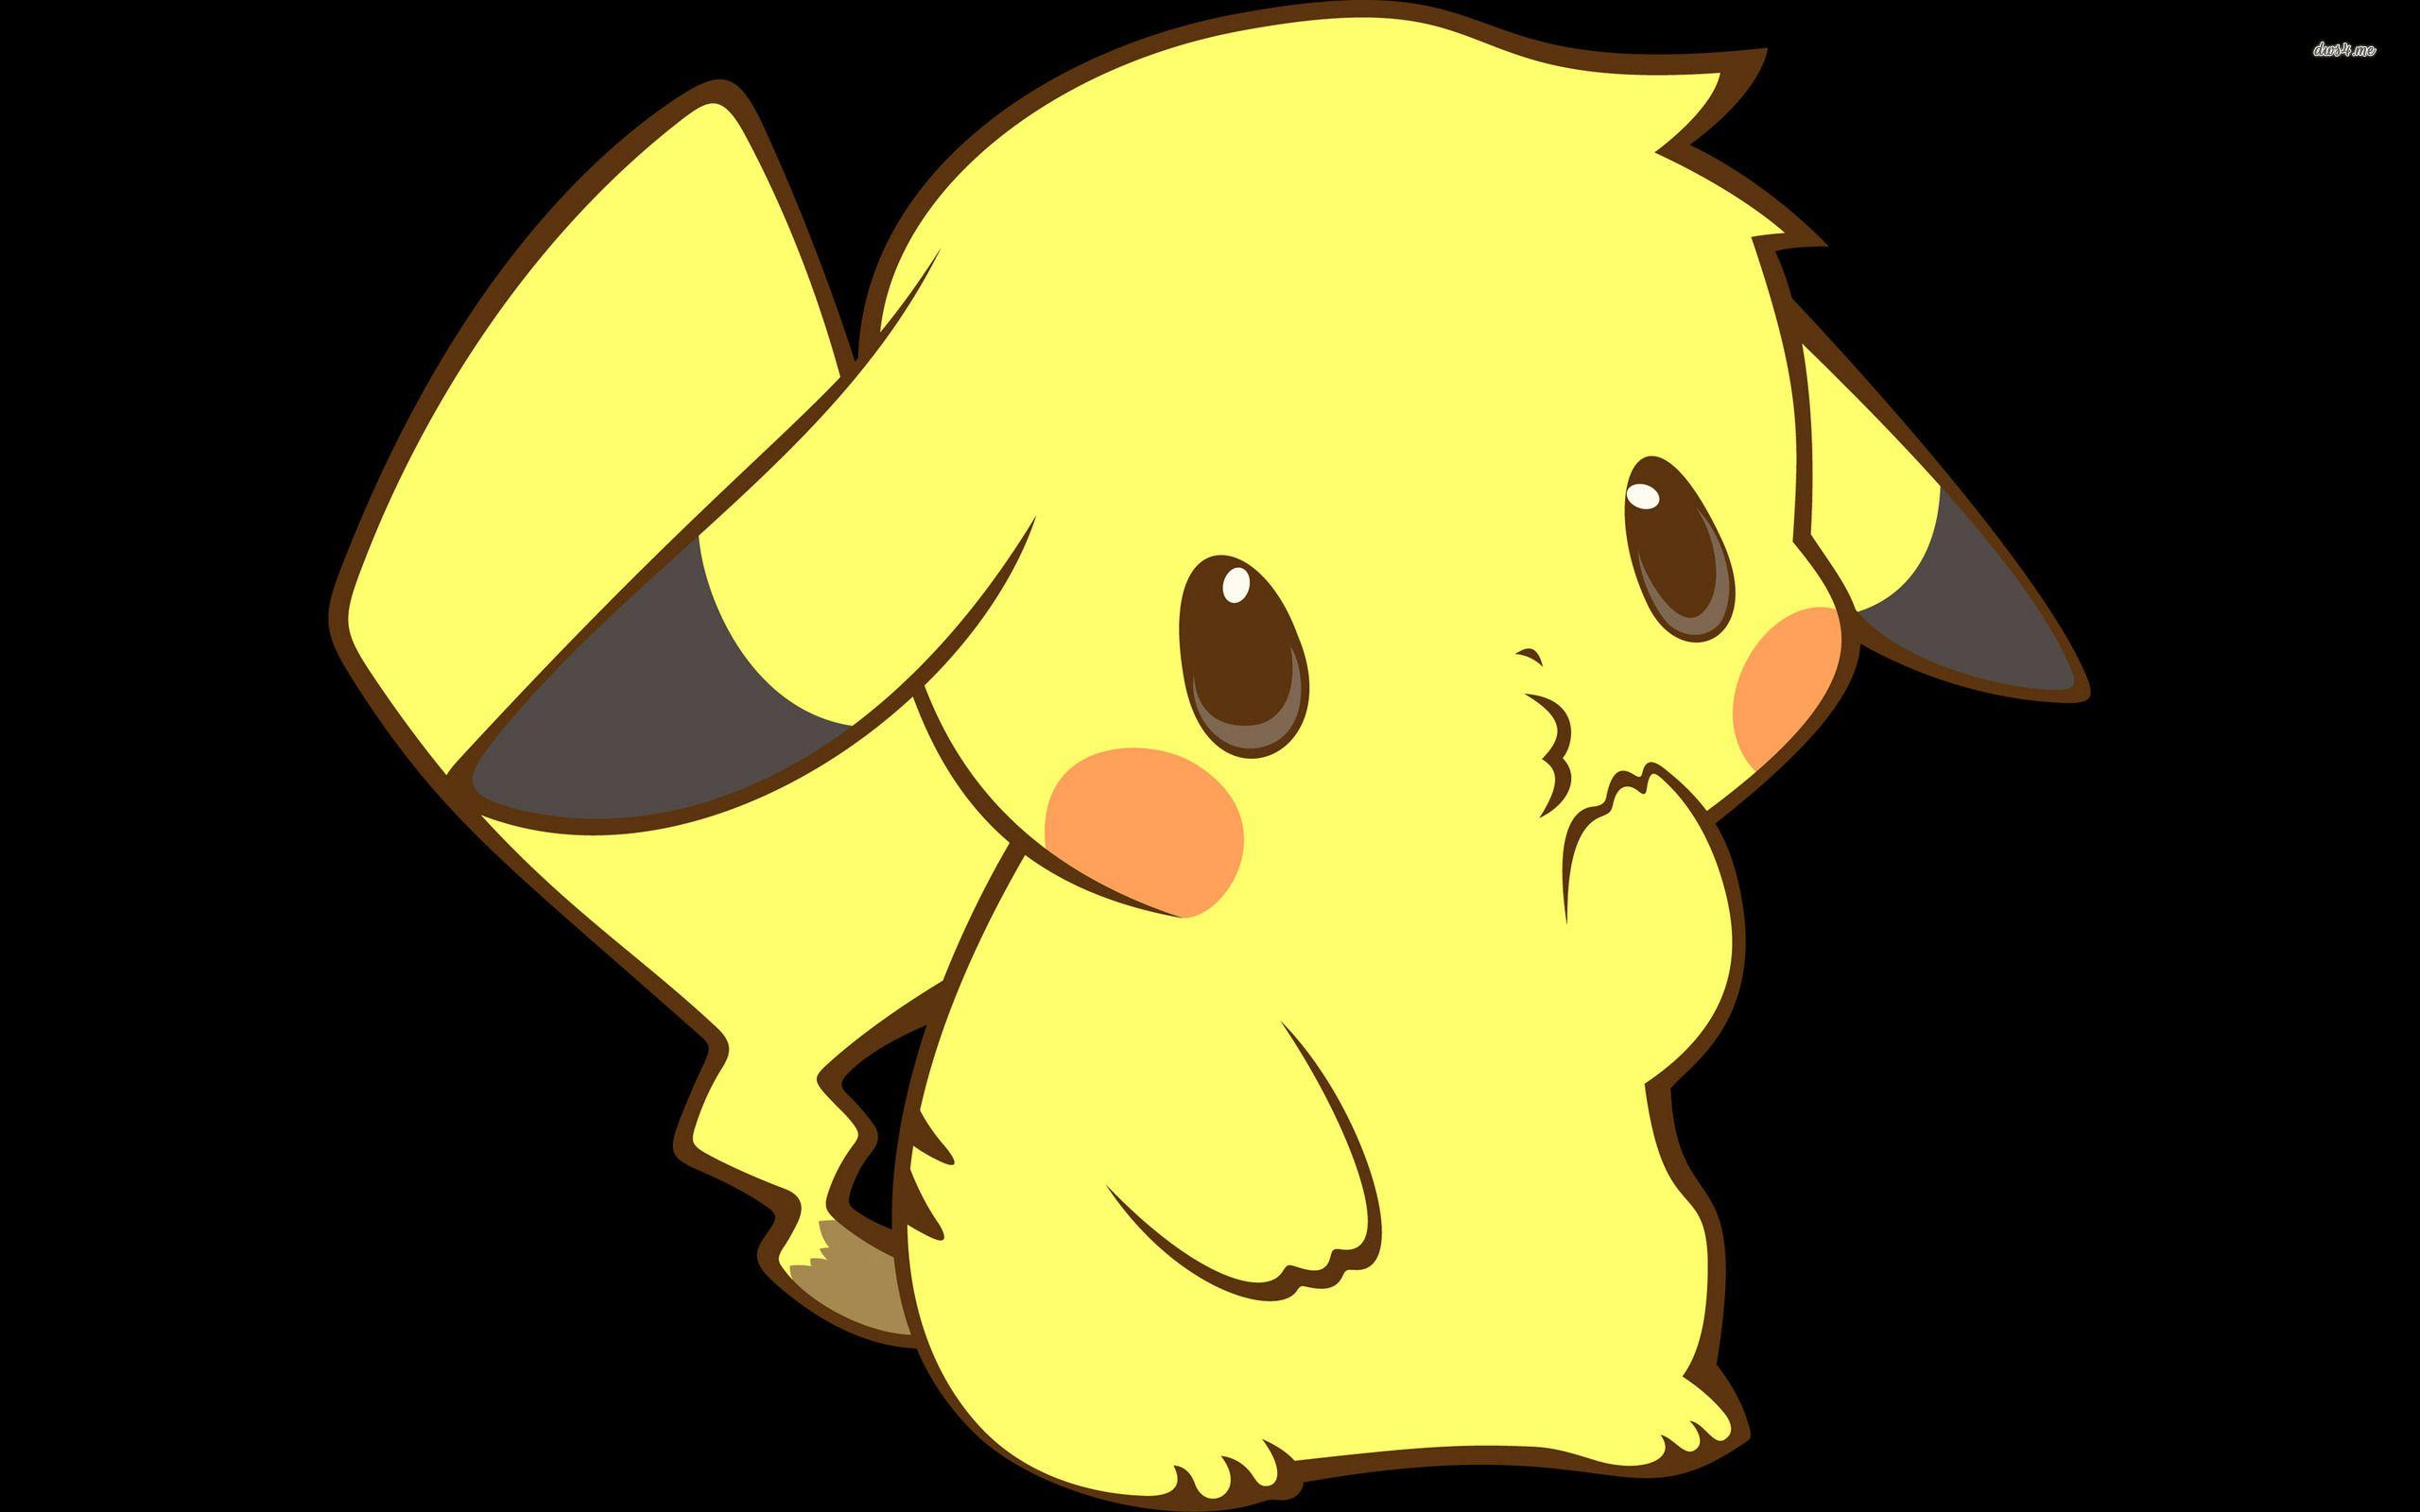 Cute Wallpapers Pokemon Wallpapers Hd Hd Wallpapers Backgrounds Images Art Photos Cute Pokemon Wallpaper Pikachu Wallpaper Cute Pikachu Cute anime pokemon wallpaper